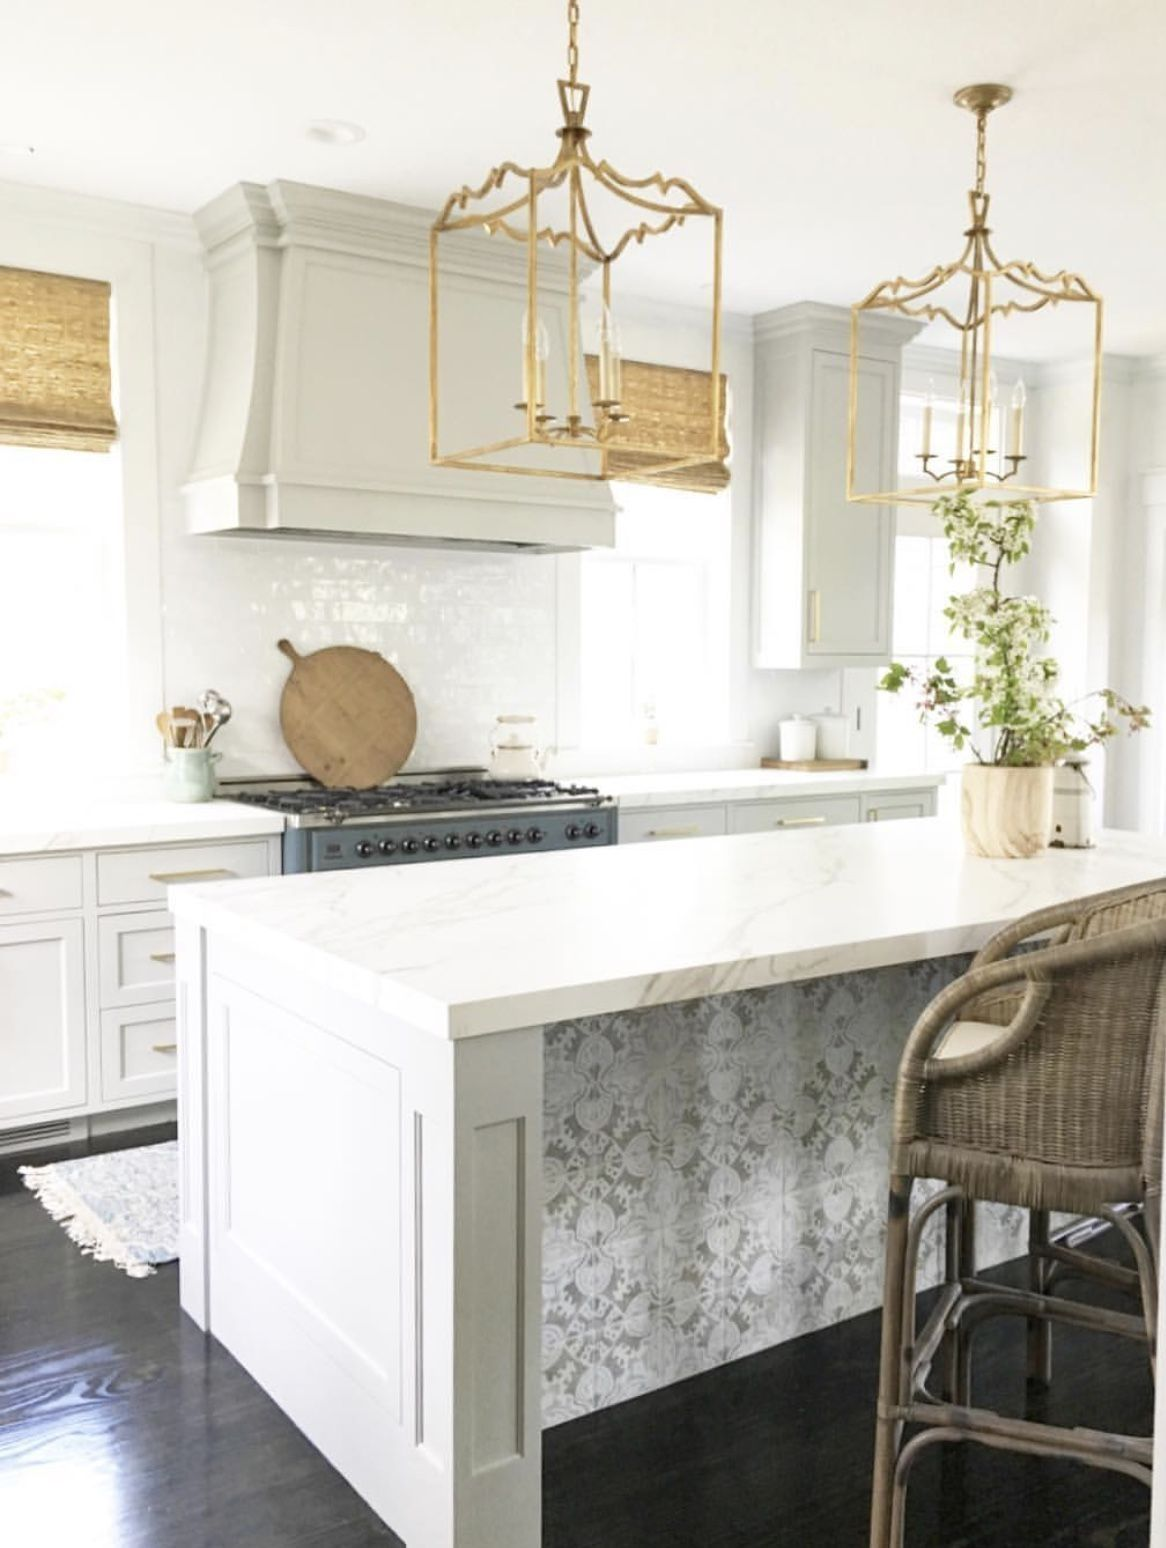 creative clean rustic kitchen decor inspiration kitchen